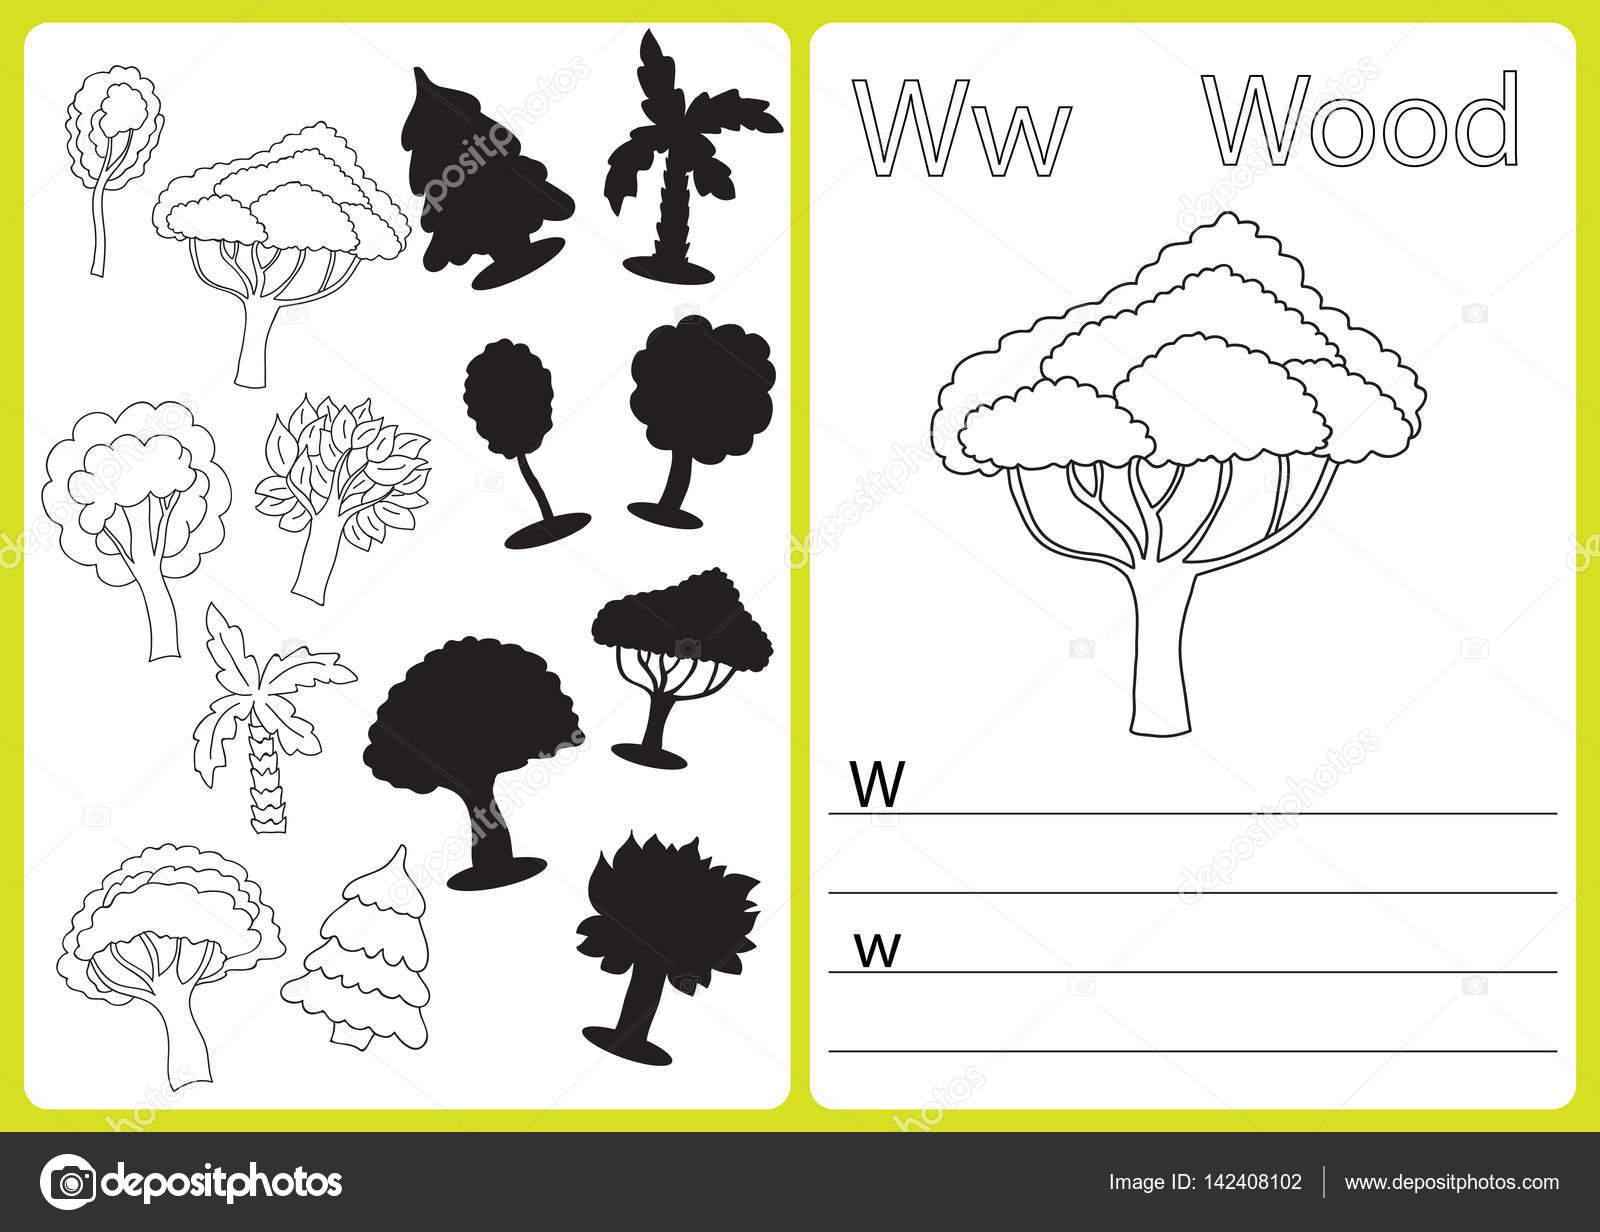 Alphabet A-Z - Rätsel-Arbeitsblatt Übungen für Kinder - Malbuch ...